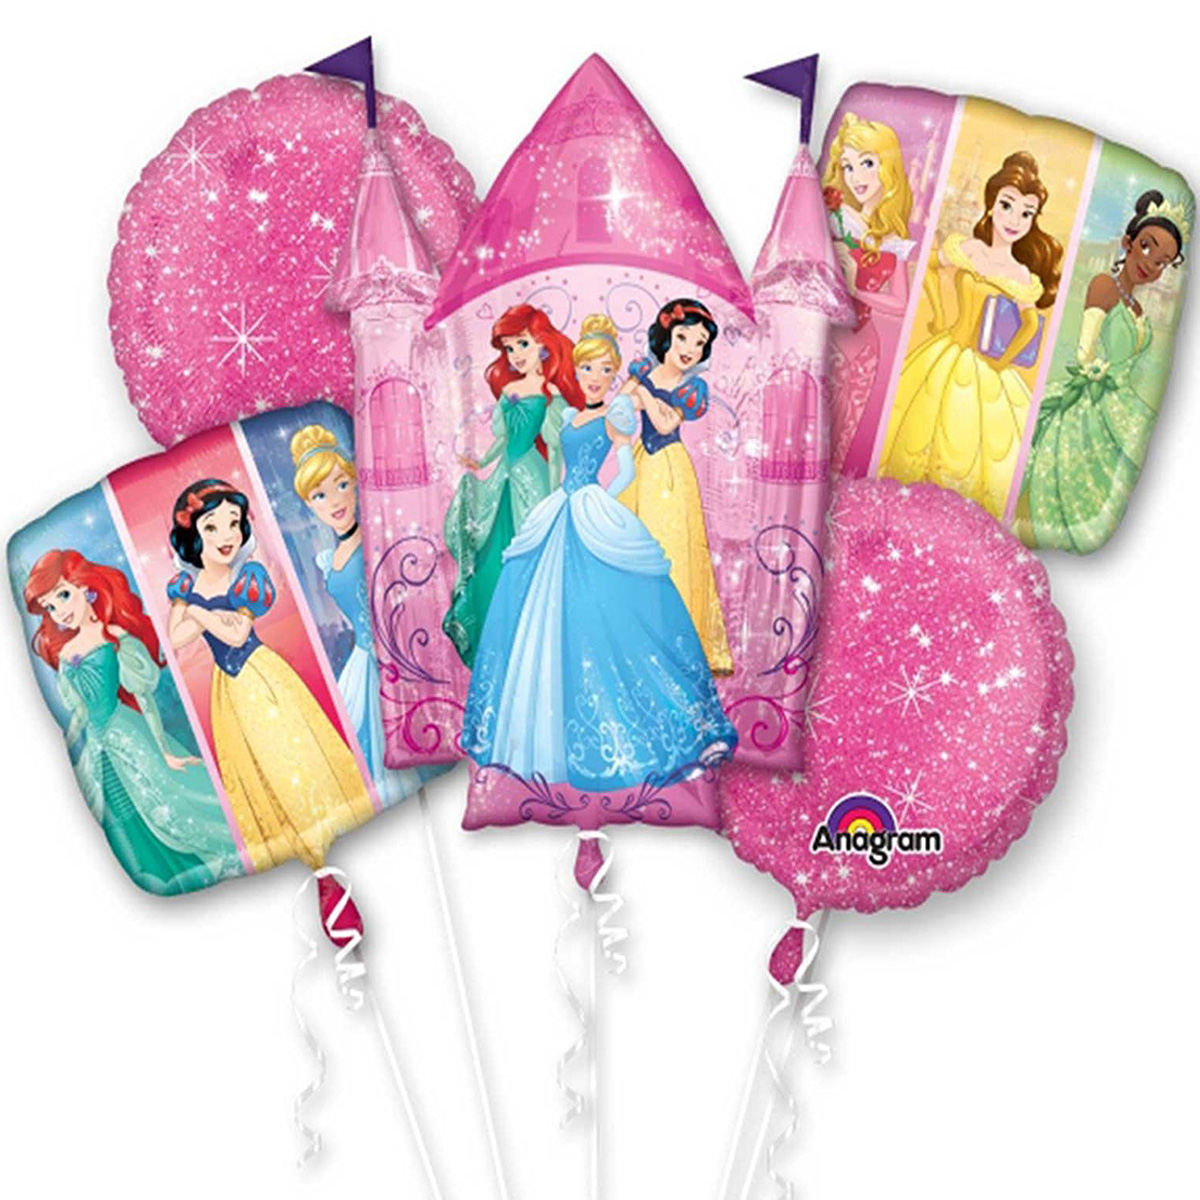 Princess Big Dream Character Authentic Licensed Theme Foil Balloon Bouquet